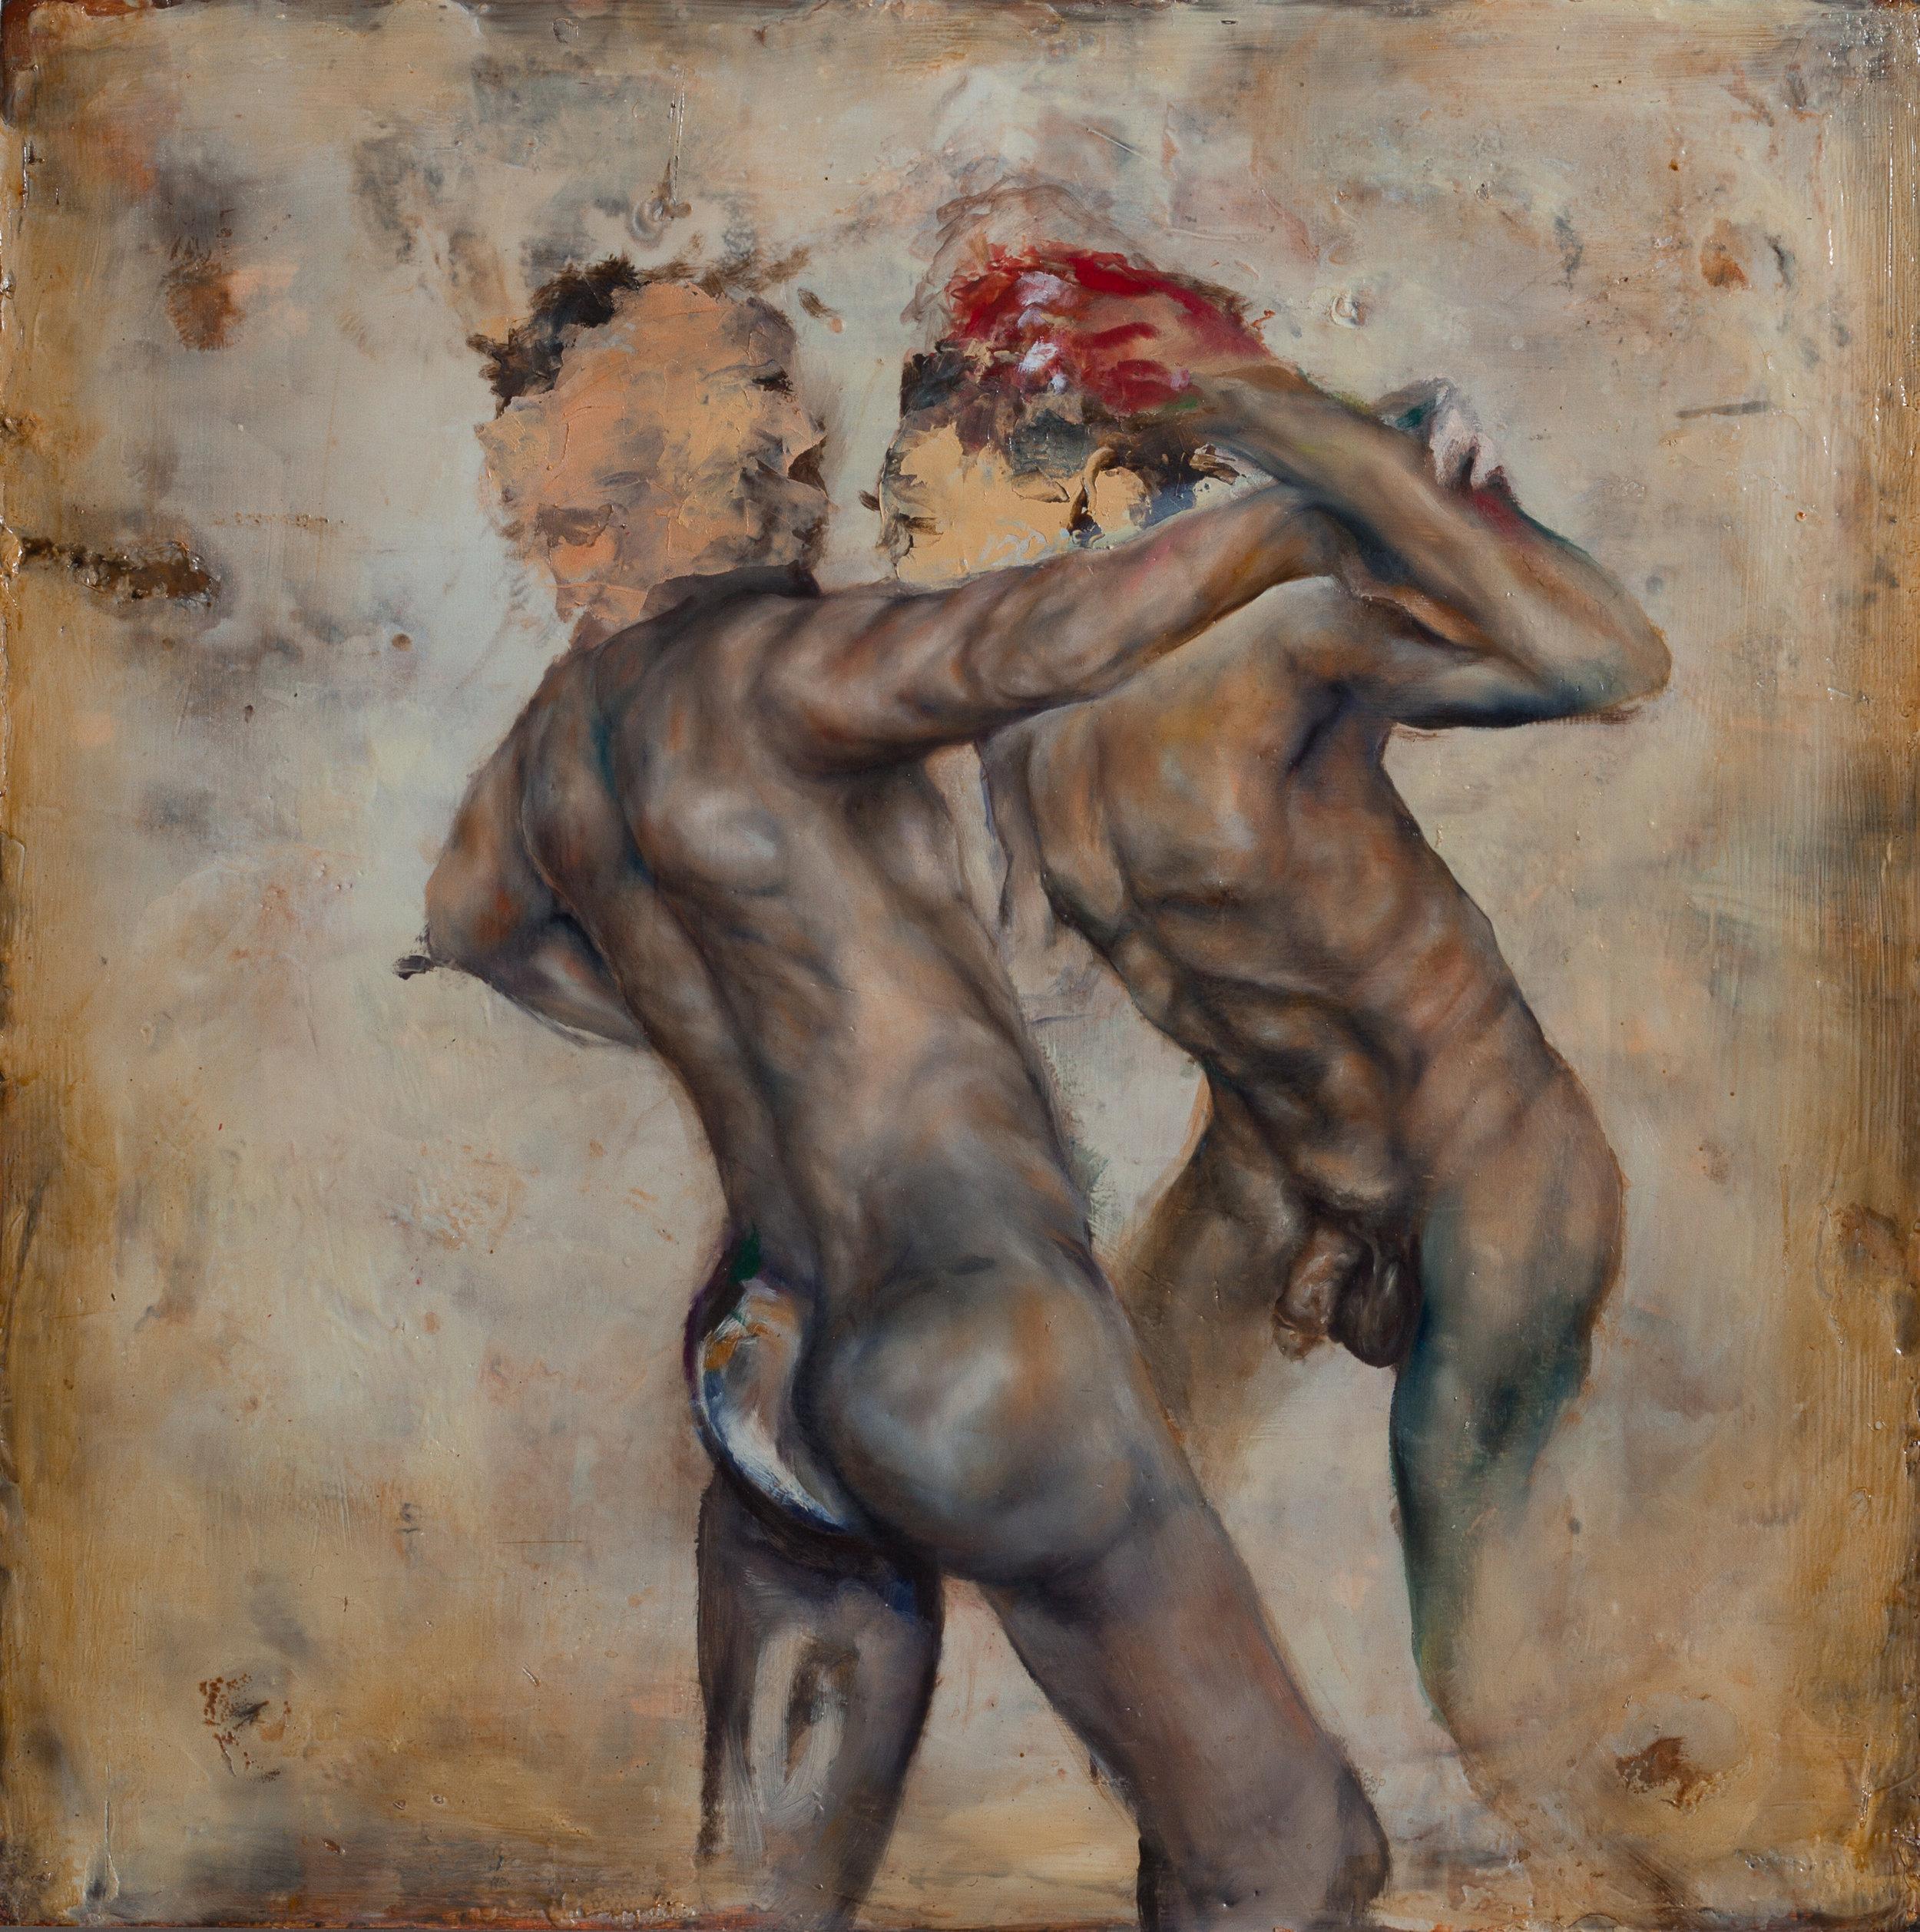 """Mimetic Rivalry"" by Eric Ondina"